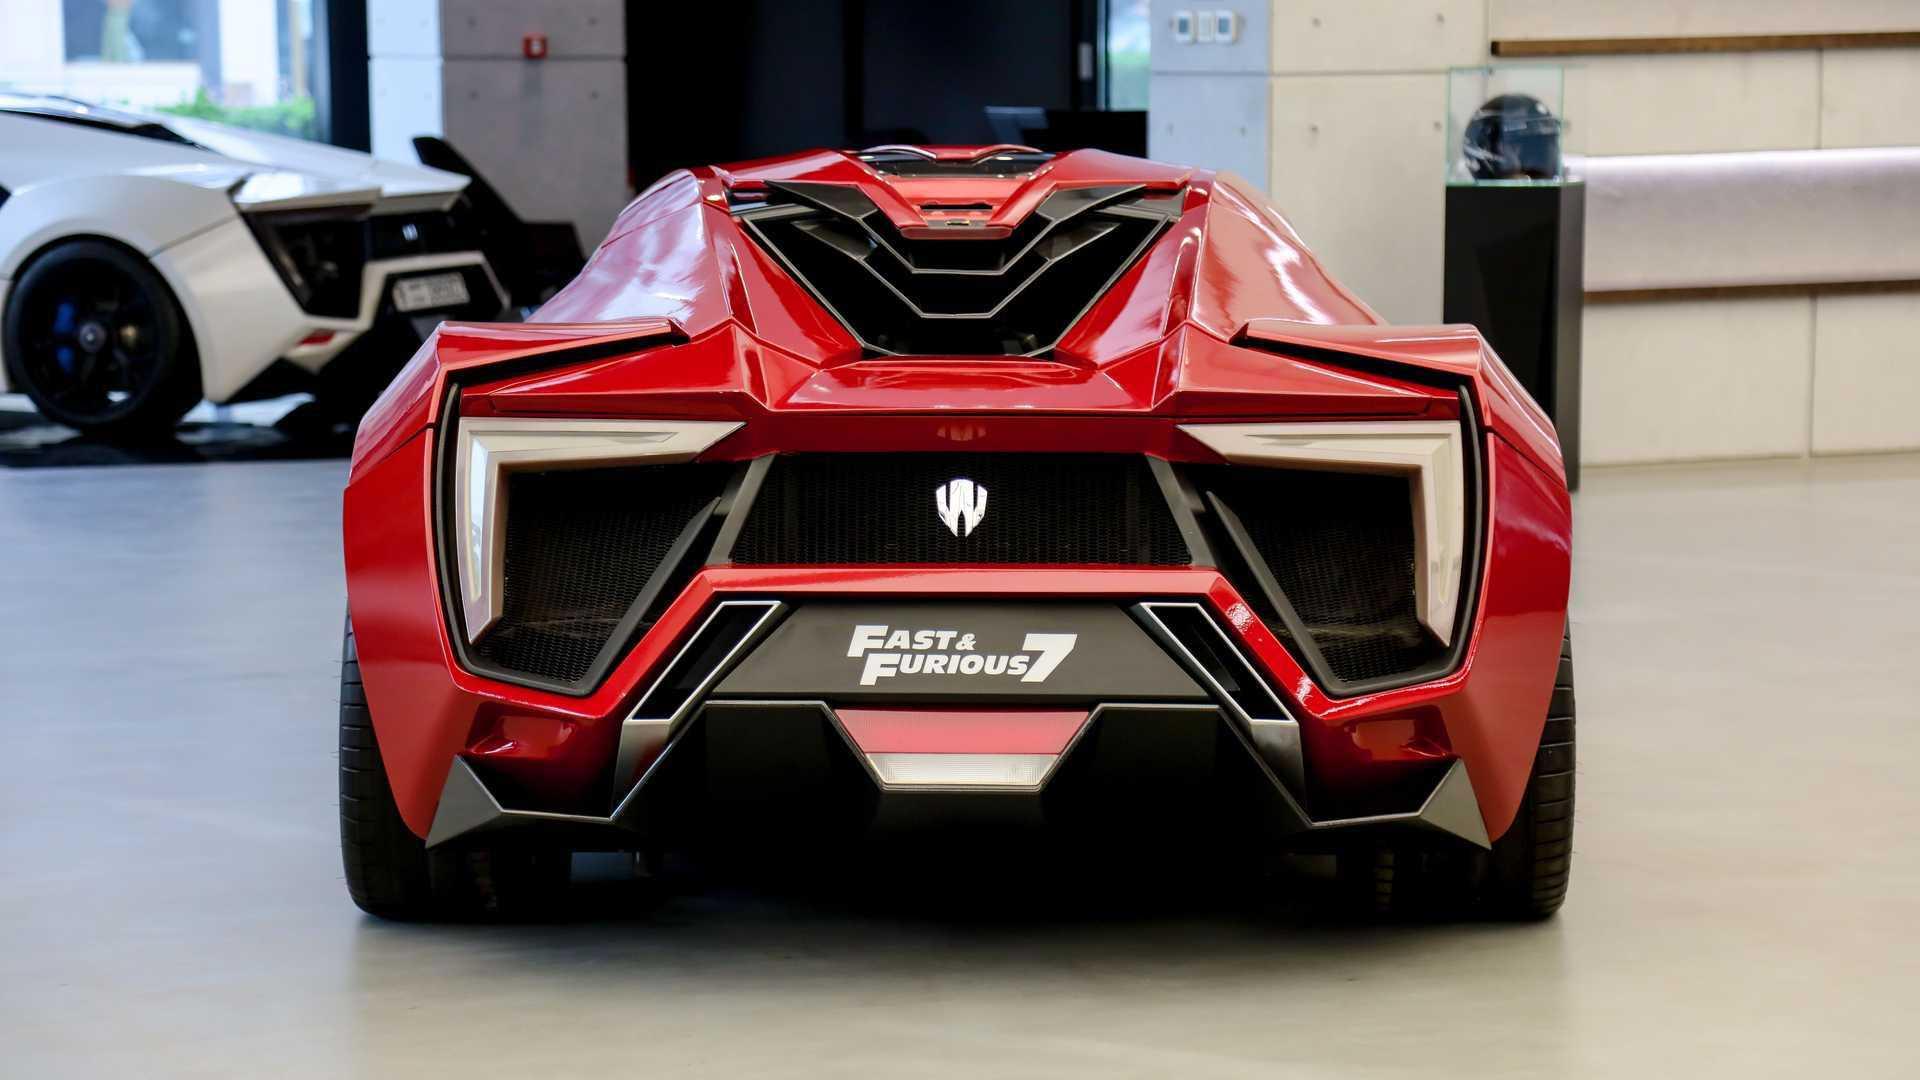 Lykan_HyperSport_stunt_car_sale-0010